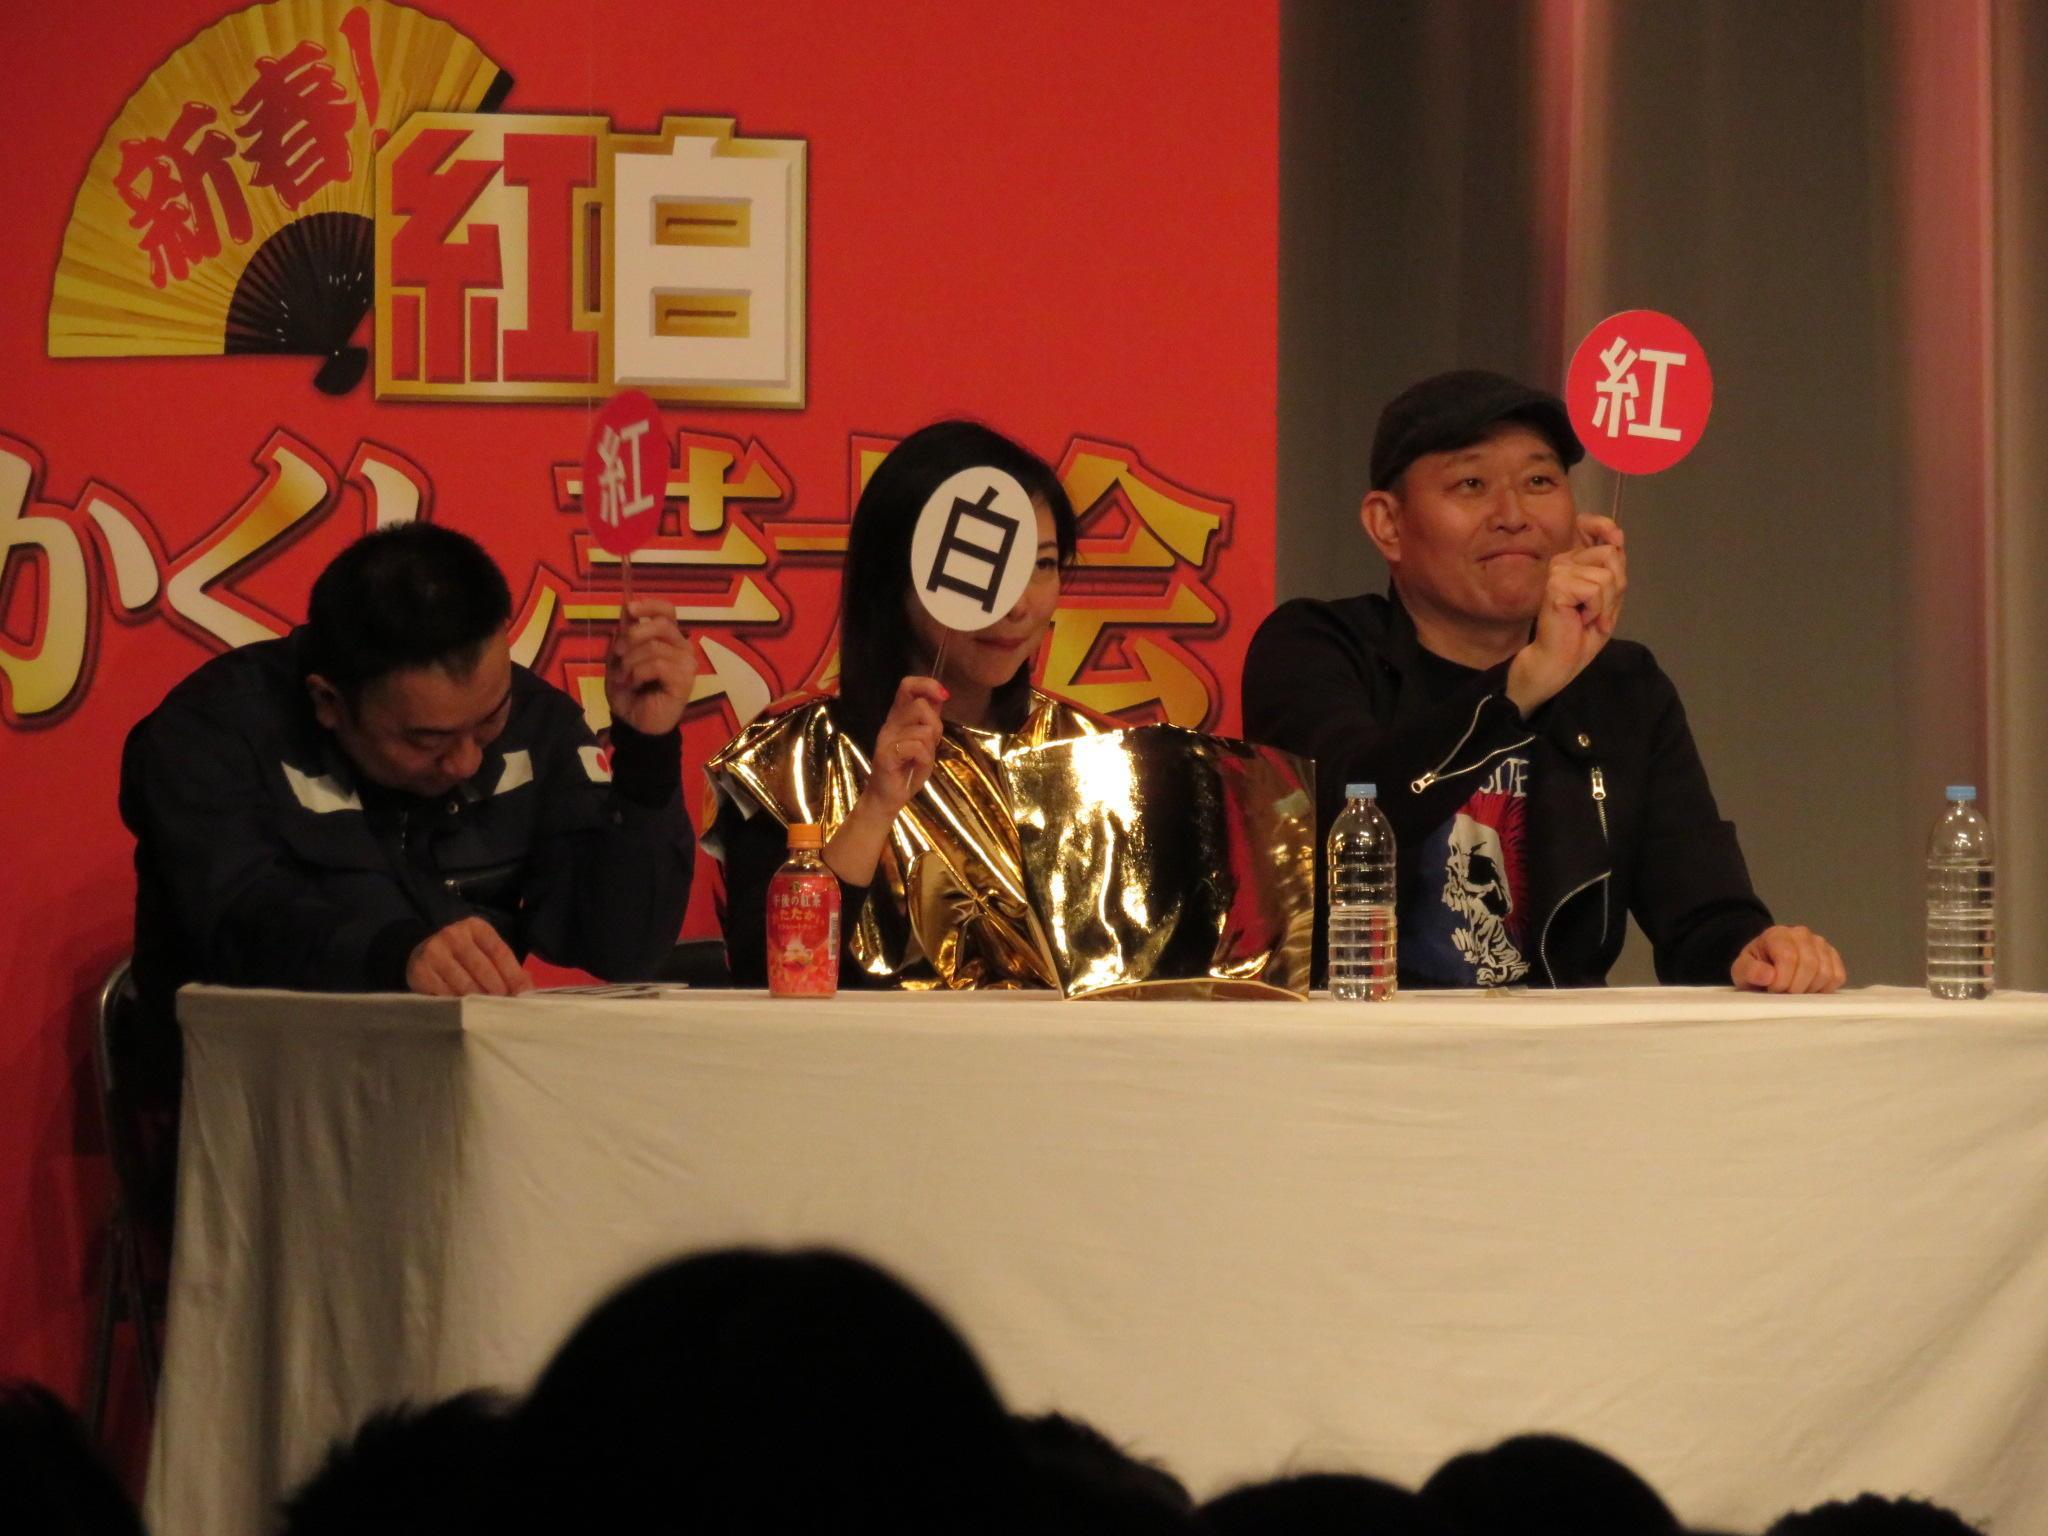 http://news.yoshimoto.co.jp/20180110191347-07bb1a2ffded275d22034fdb0feefbc26c53e733.jpg